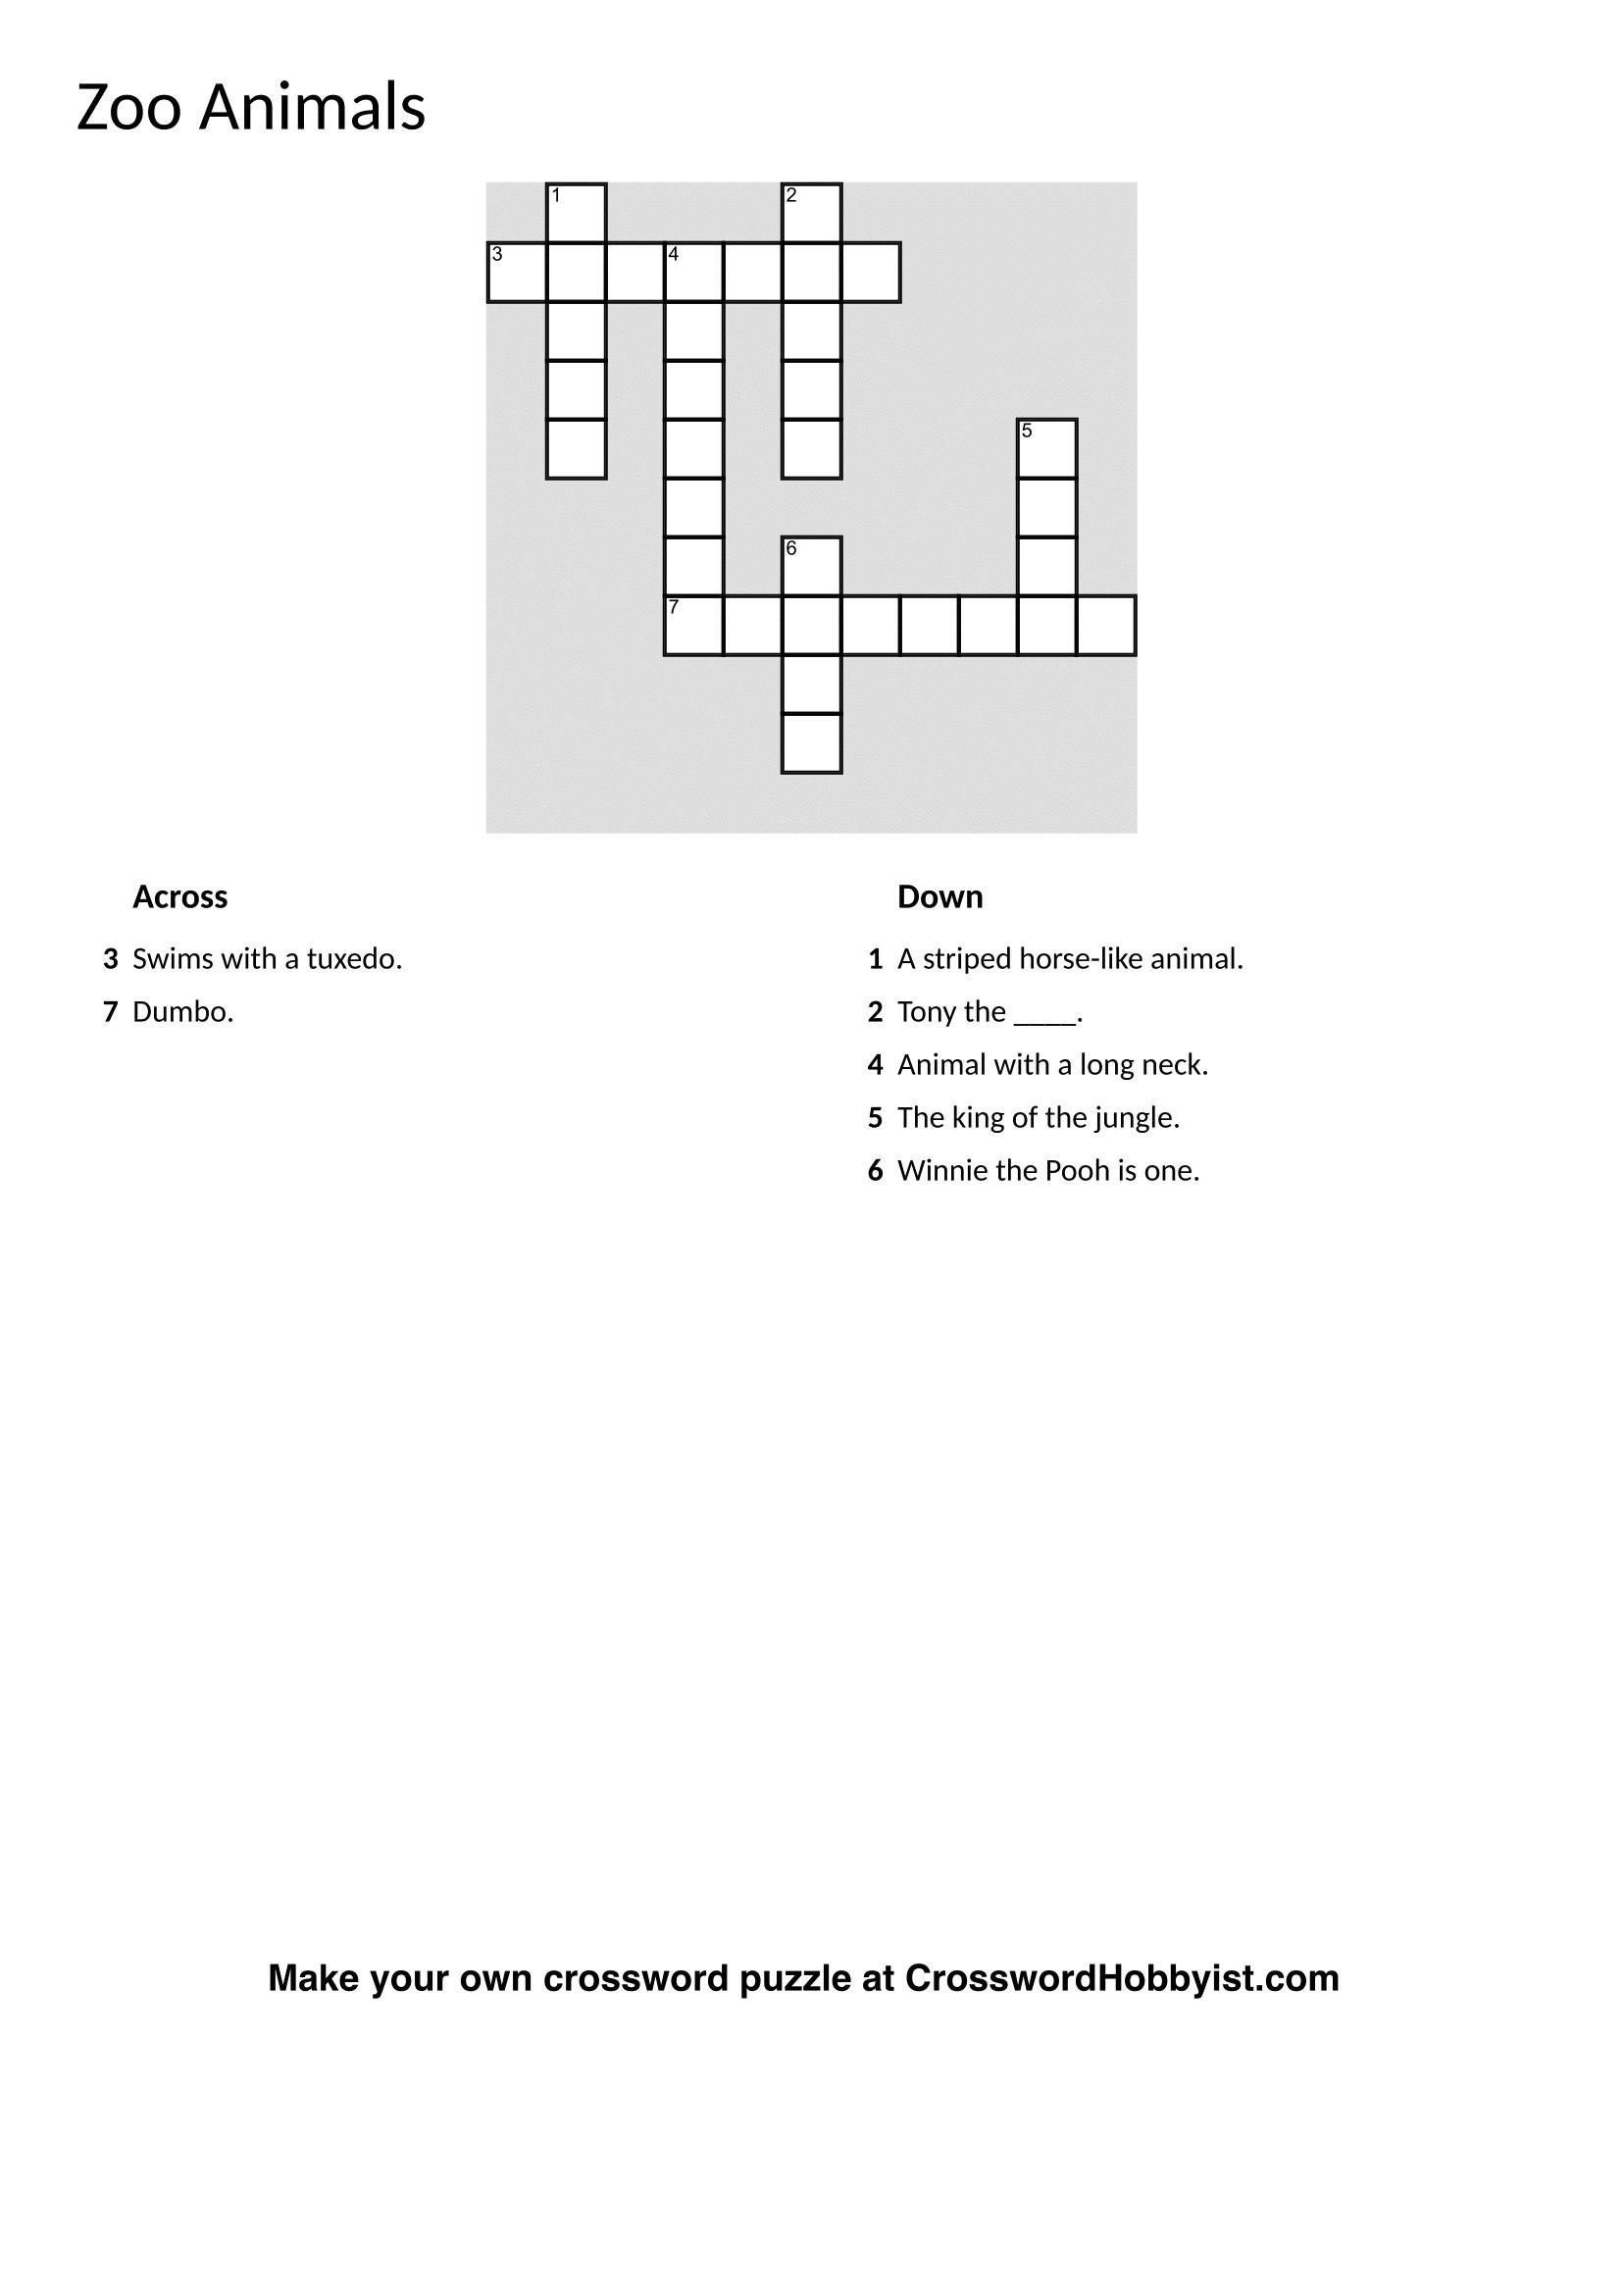 Jigsaw Puzzle Maker Free Online Printable | Free Printables - Make Your Own Crossword Puzzle Free Online Printable